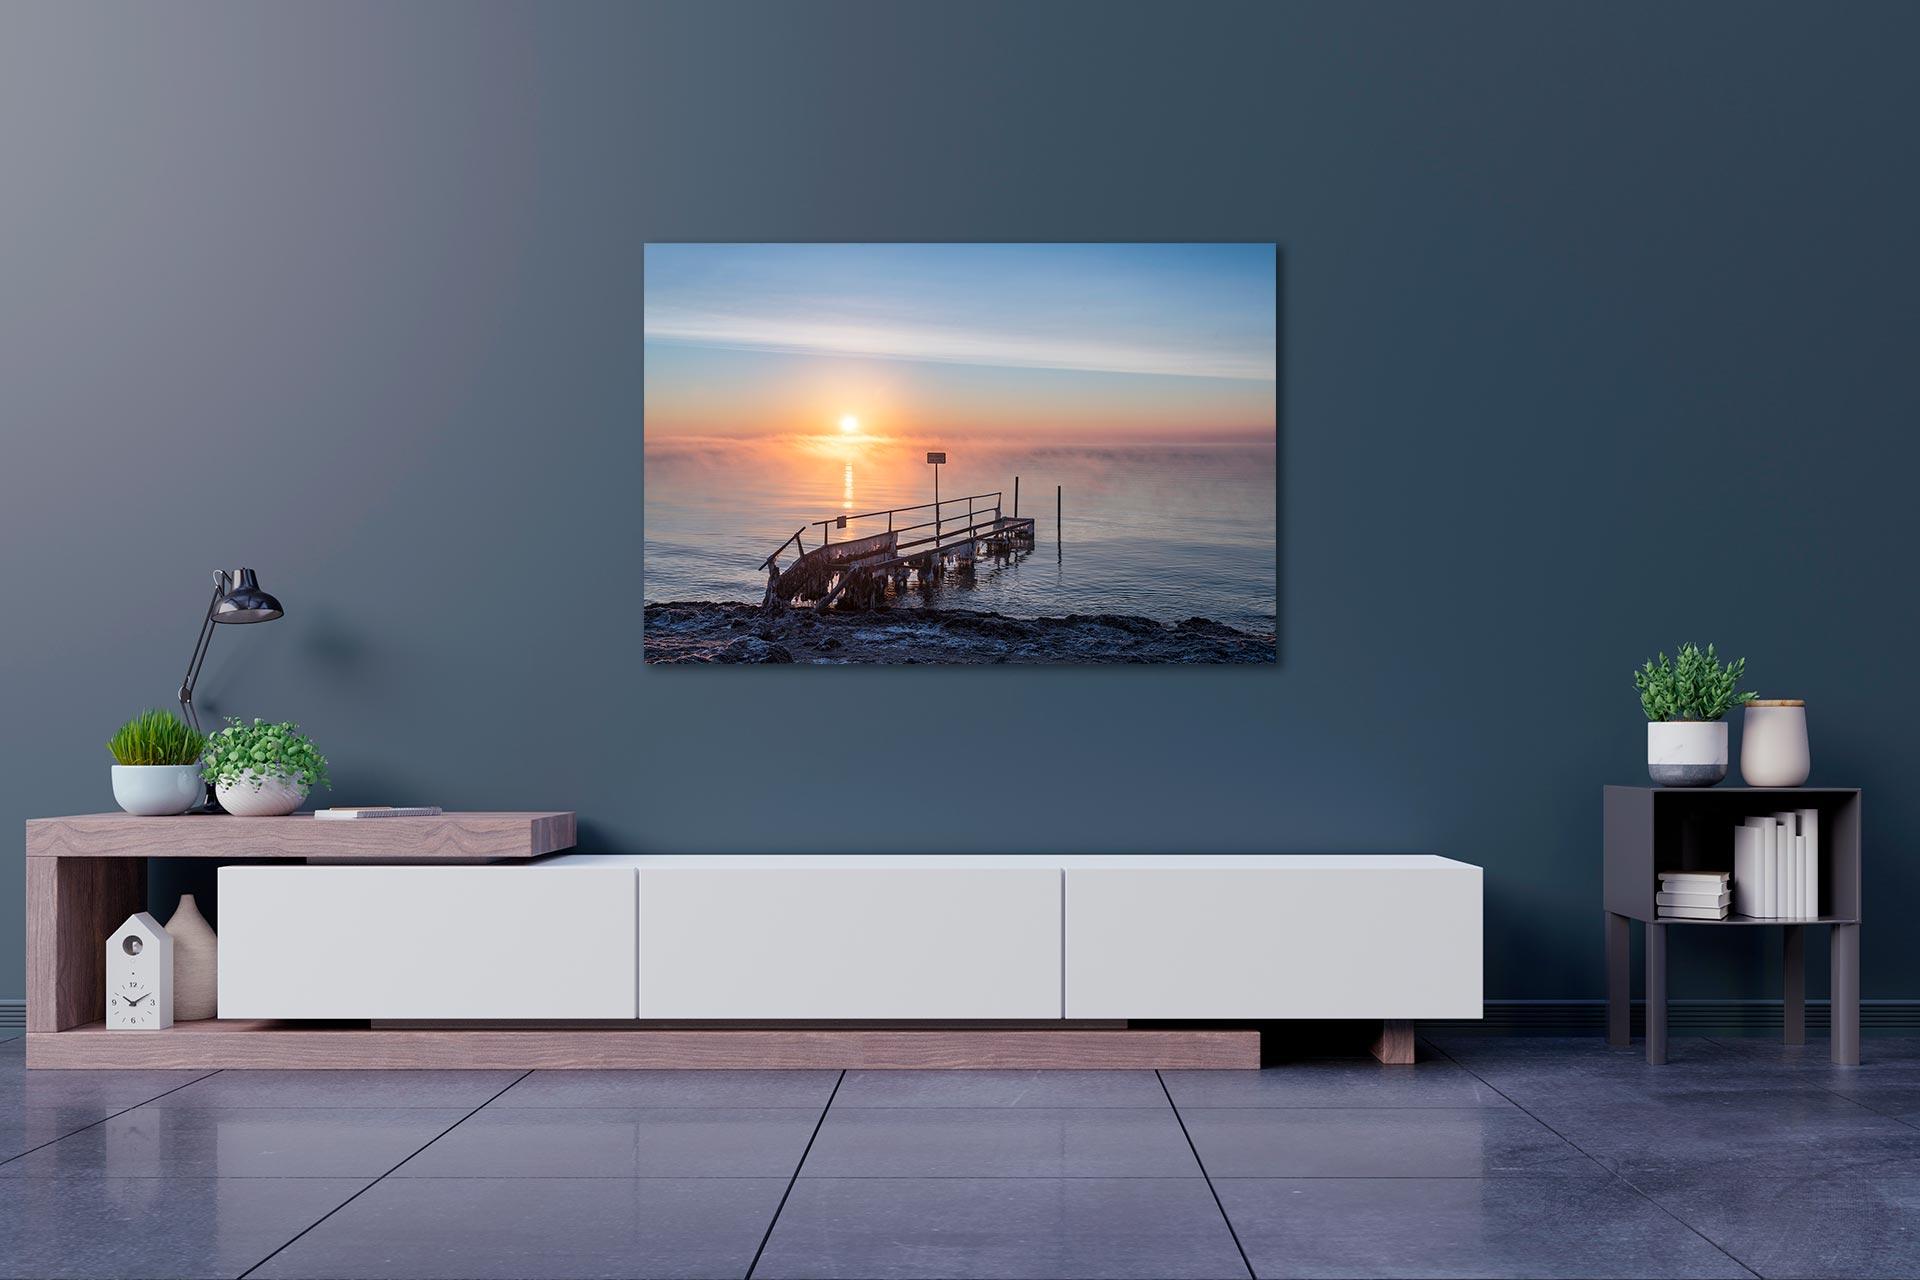 LCW506-lensterstrand-ostsee-wandbild-leinwand-acrylglas-aludibond-wohnzimmer